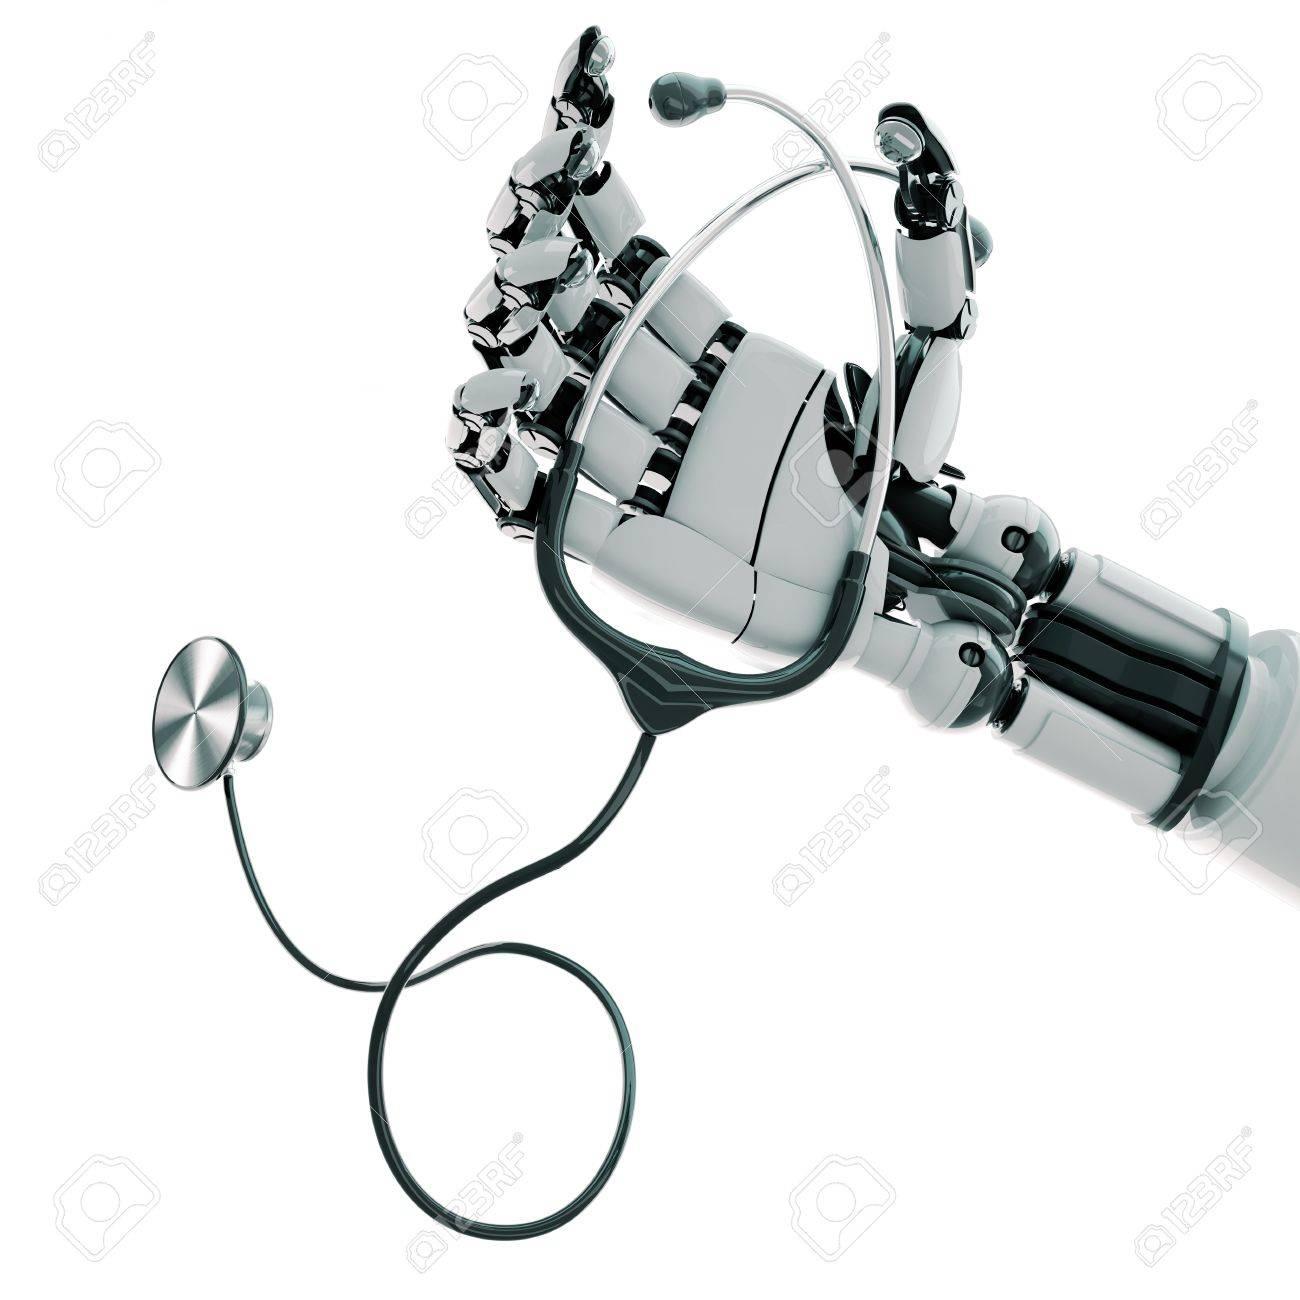 Isolated robotic arm with stethoscope on white background Stock Photo - 17697196